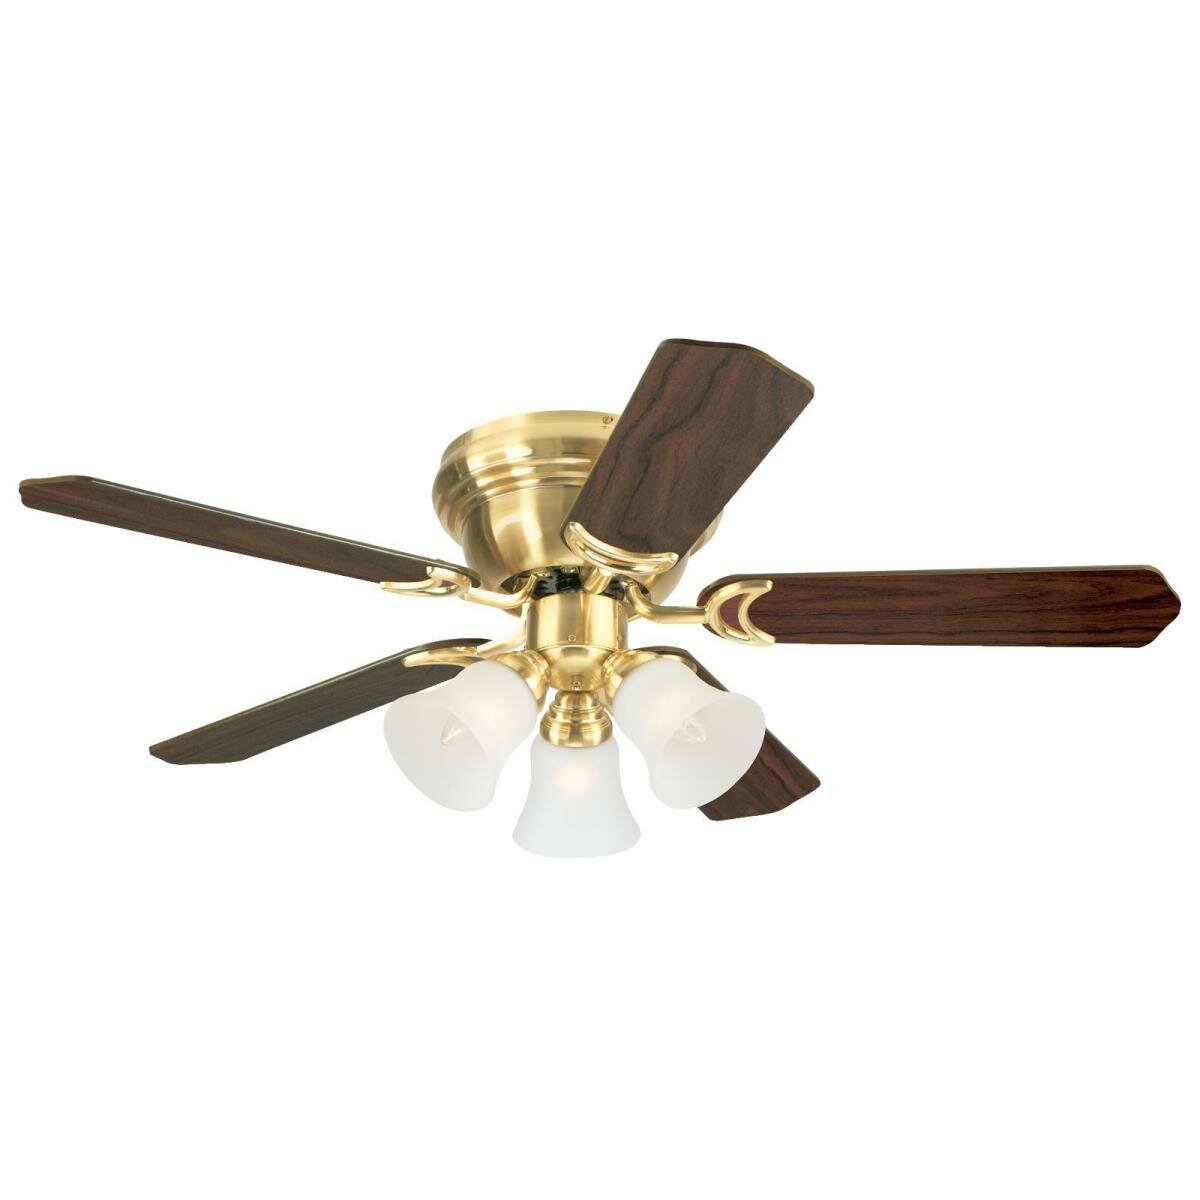 Charlton Home 42 Rosenblatt 5 Blade Standard Ceiling Fan With Pull Chain And Light Kit Included Reviews Wayfair